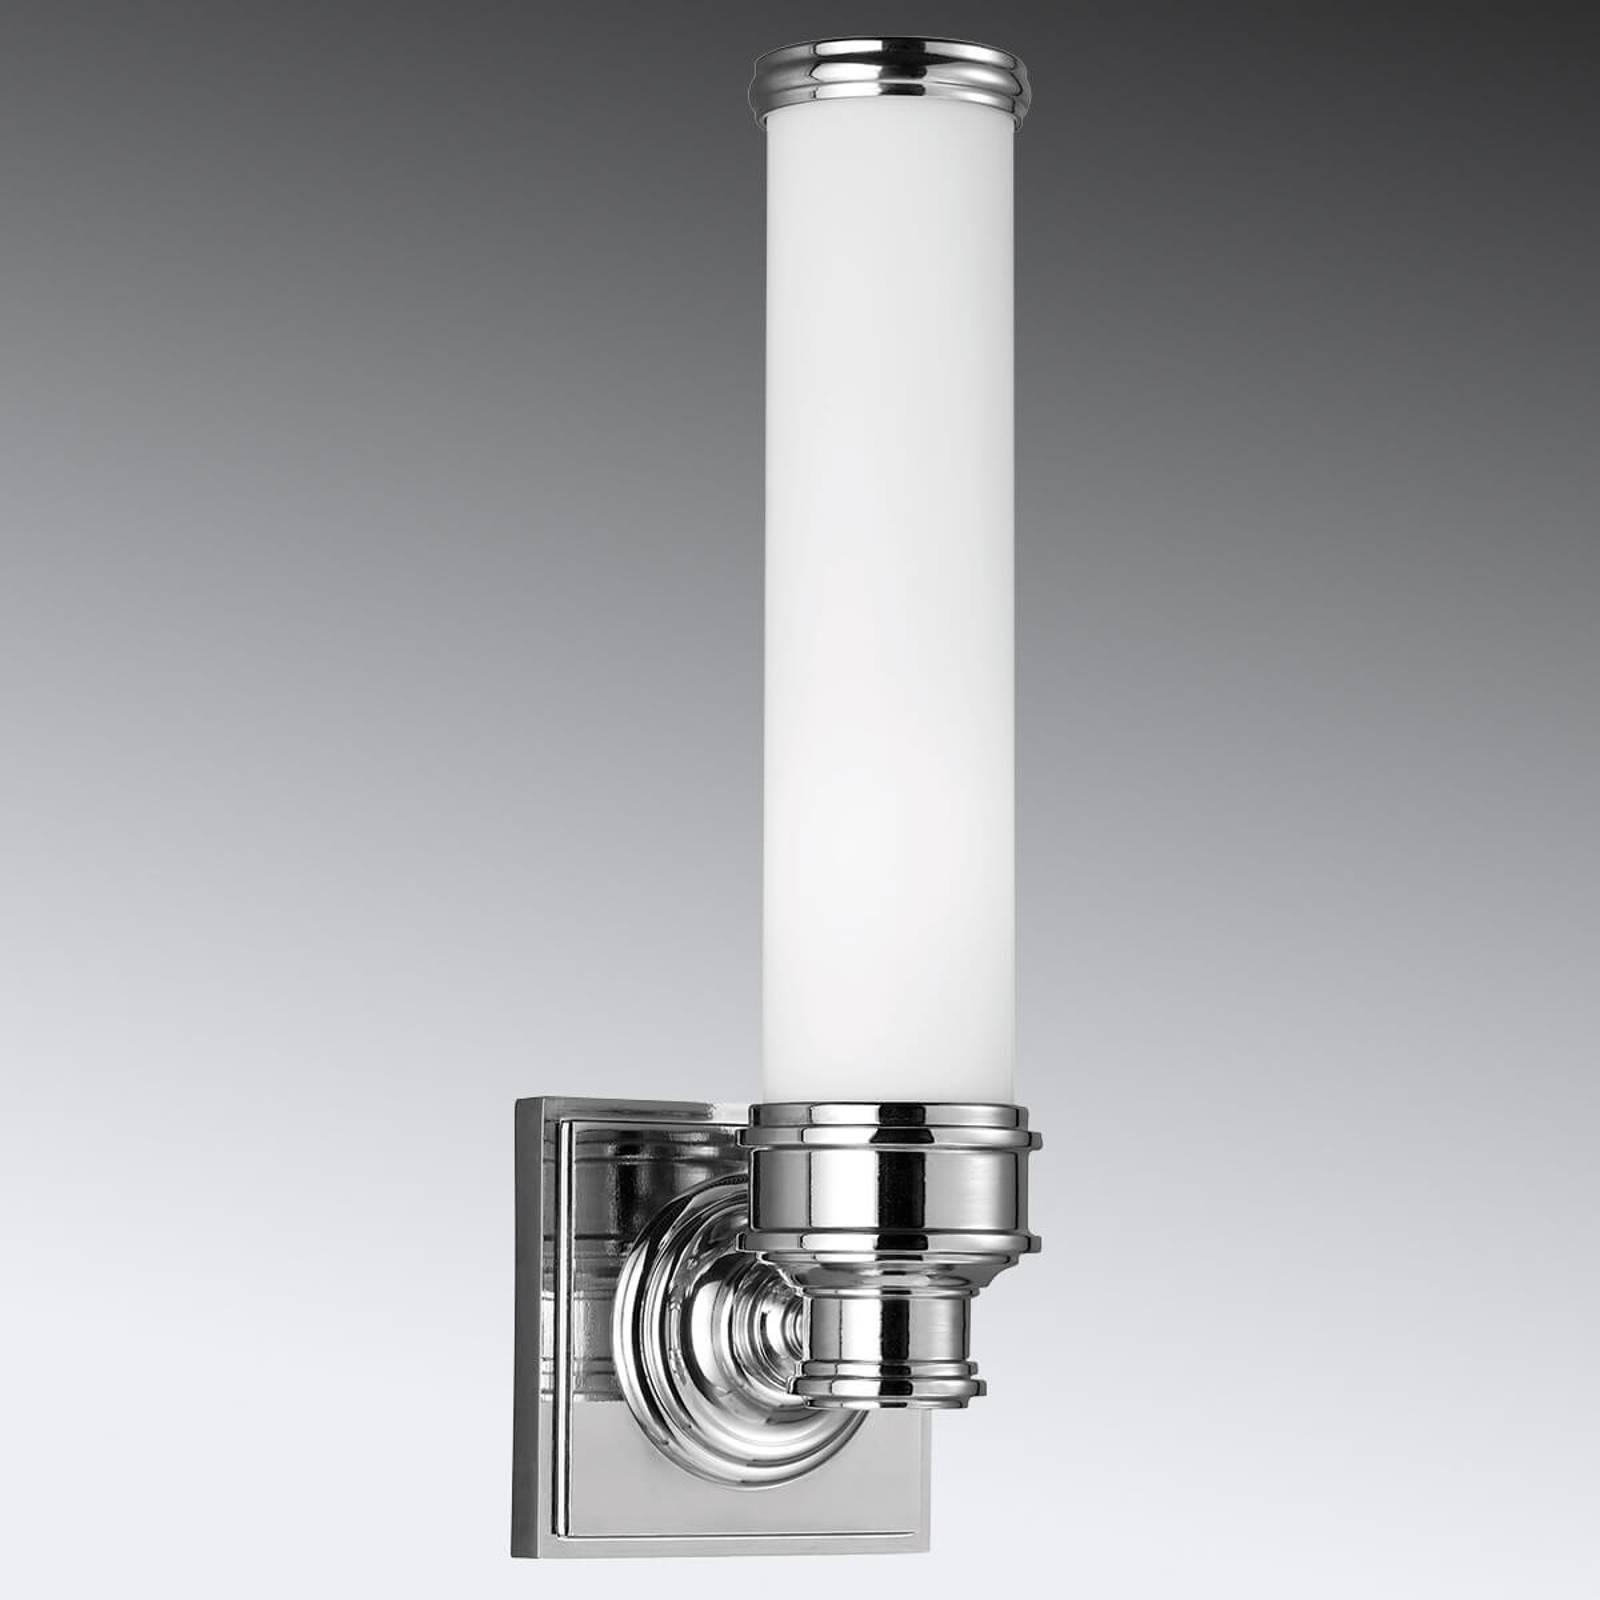 LED wandlamp Payne voor in de badkamer